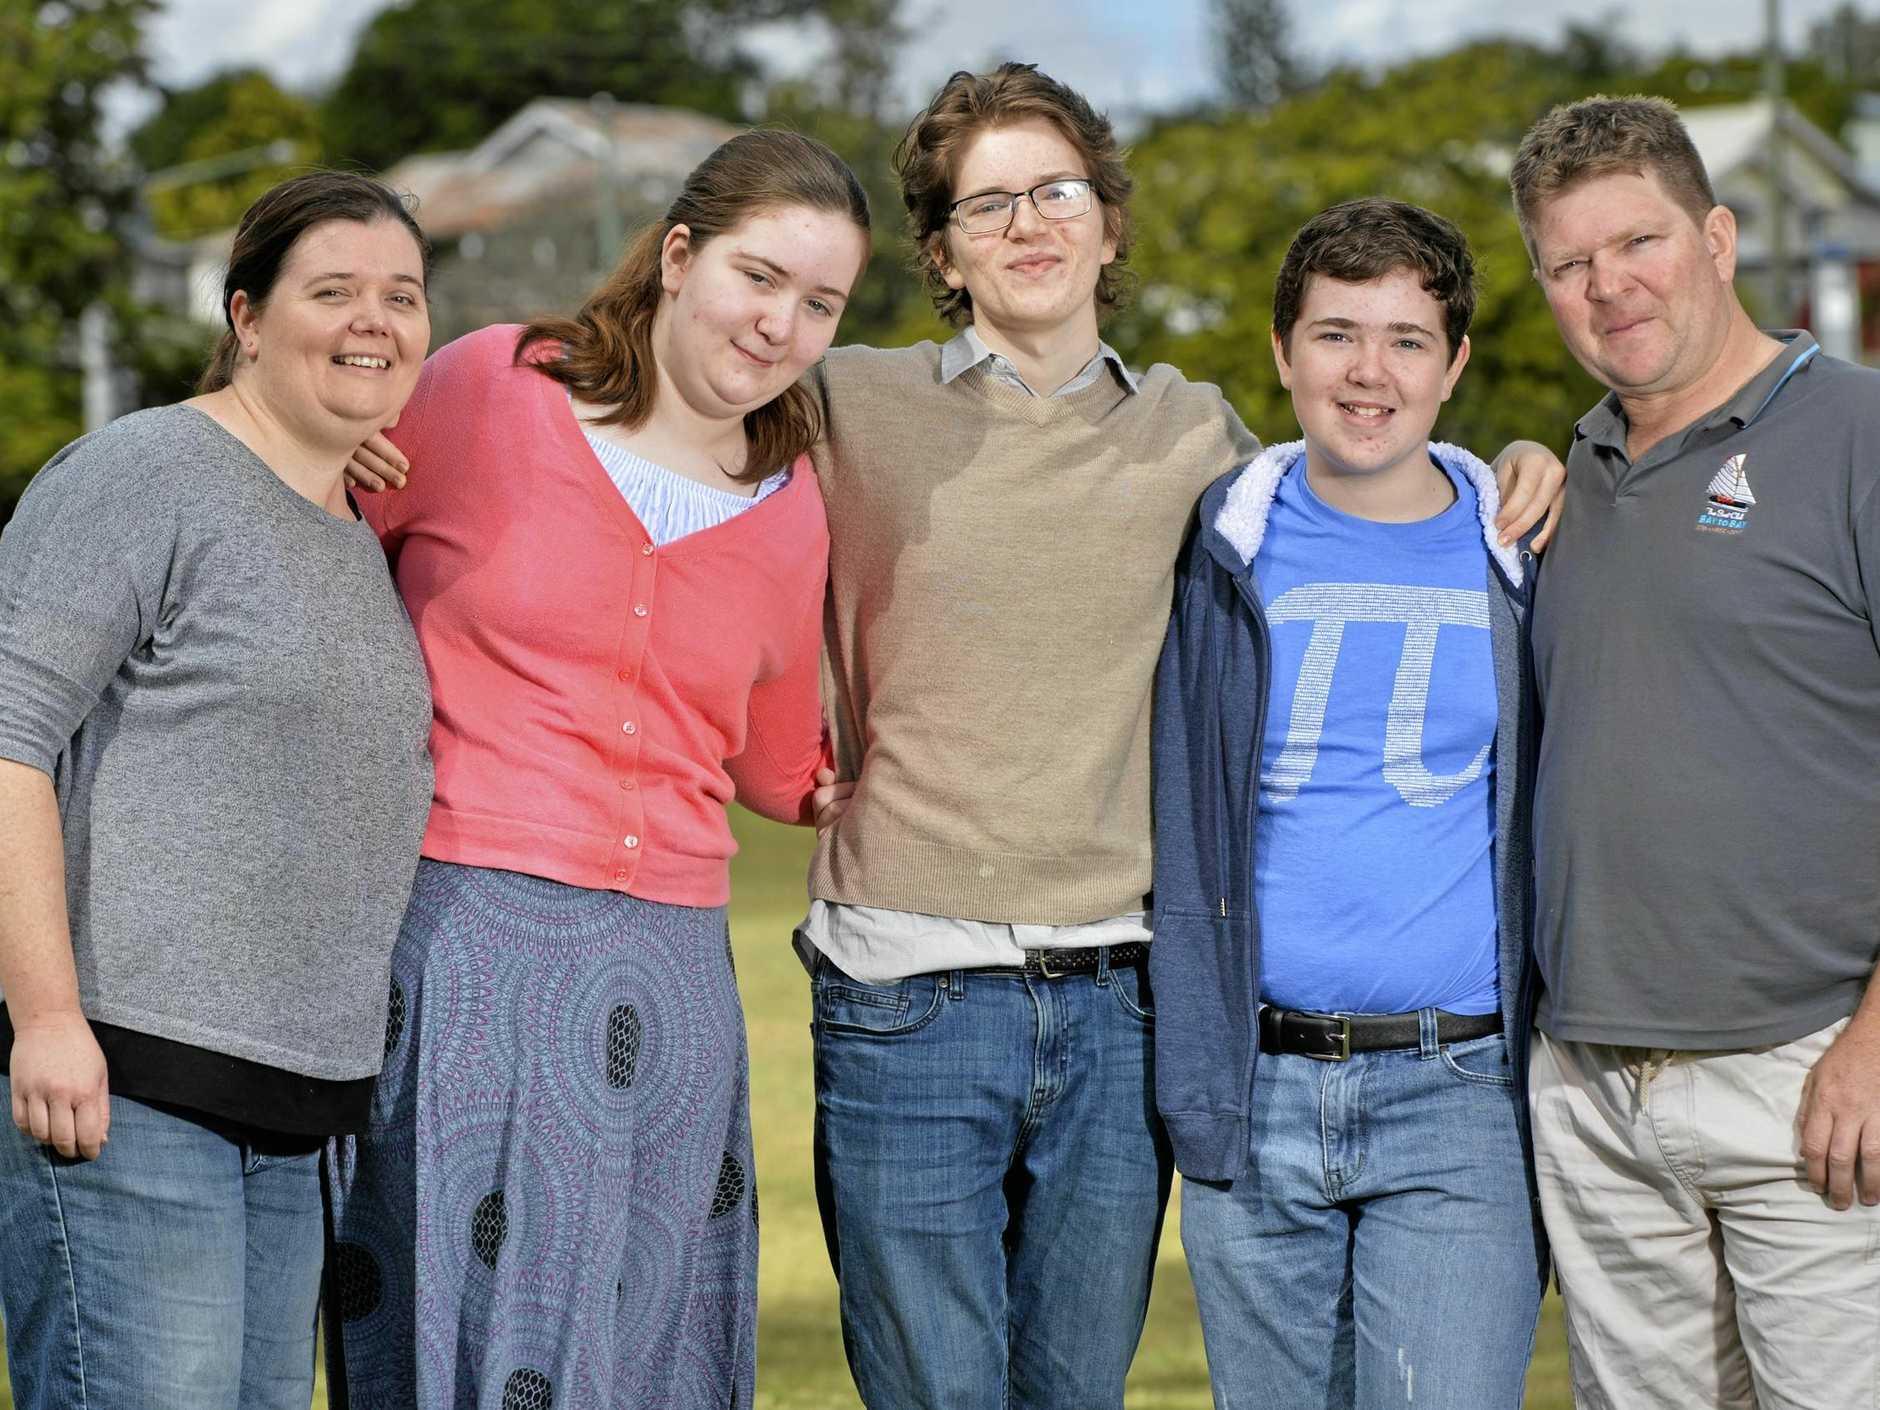 LUCKY FAMILY: McLeod family Kathy, Gemma, 14, Kieran, 16, Chris, 12 and Joseph get ready for the Walk 4 Brain Cancer in August.